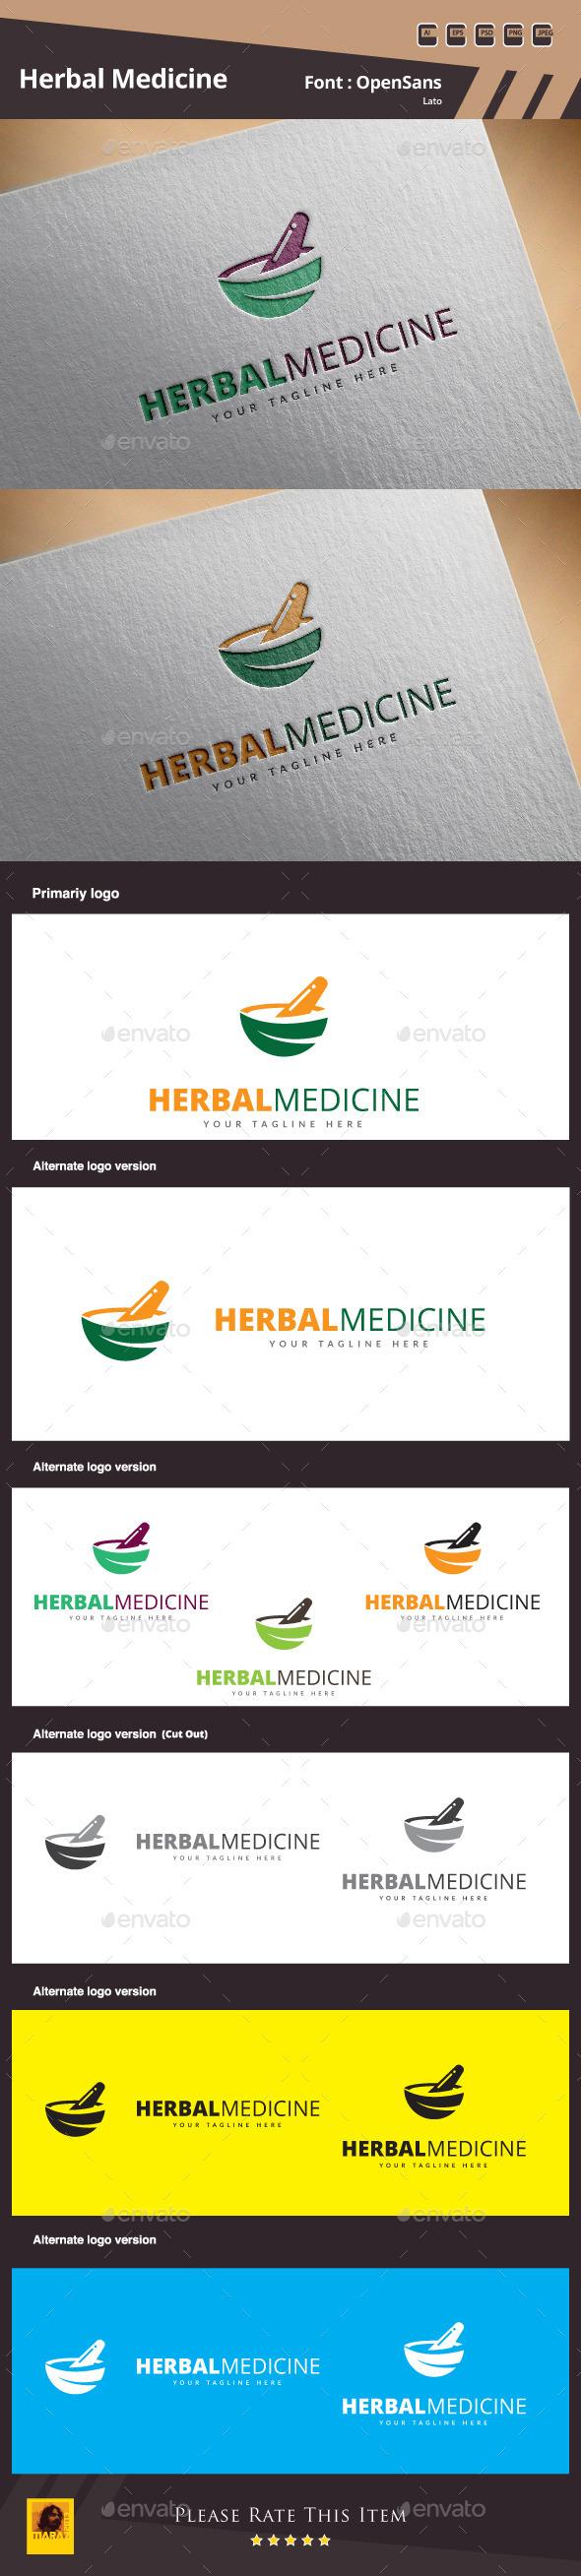 GraphicRiver Herbal Medicine Logo Template 11511795